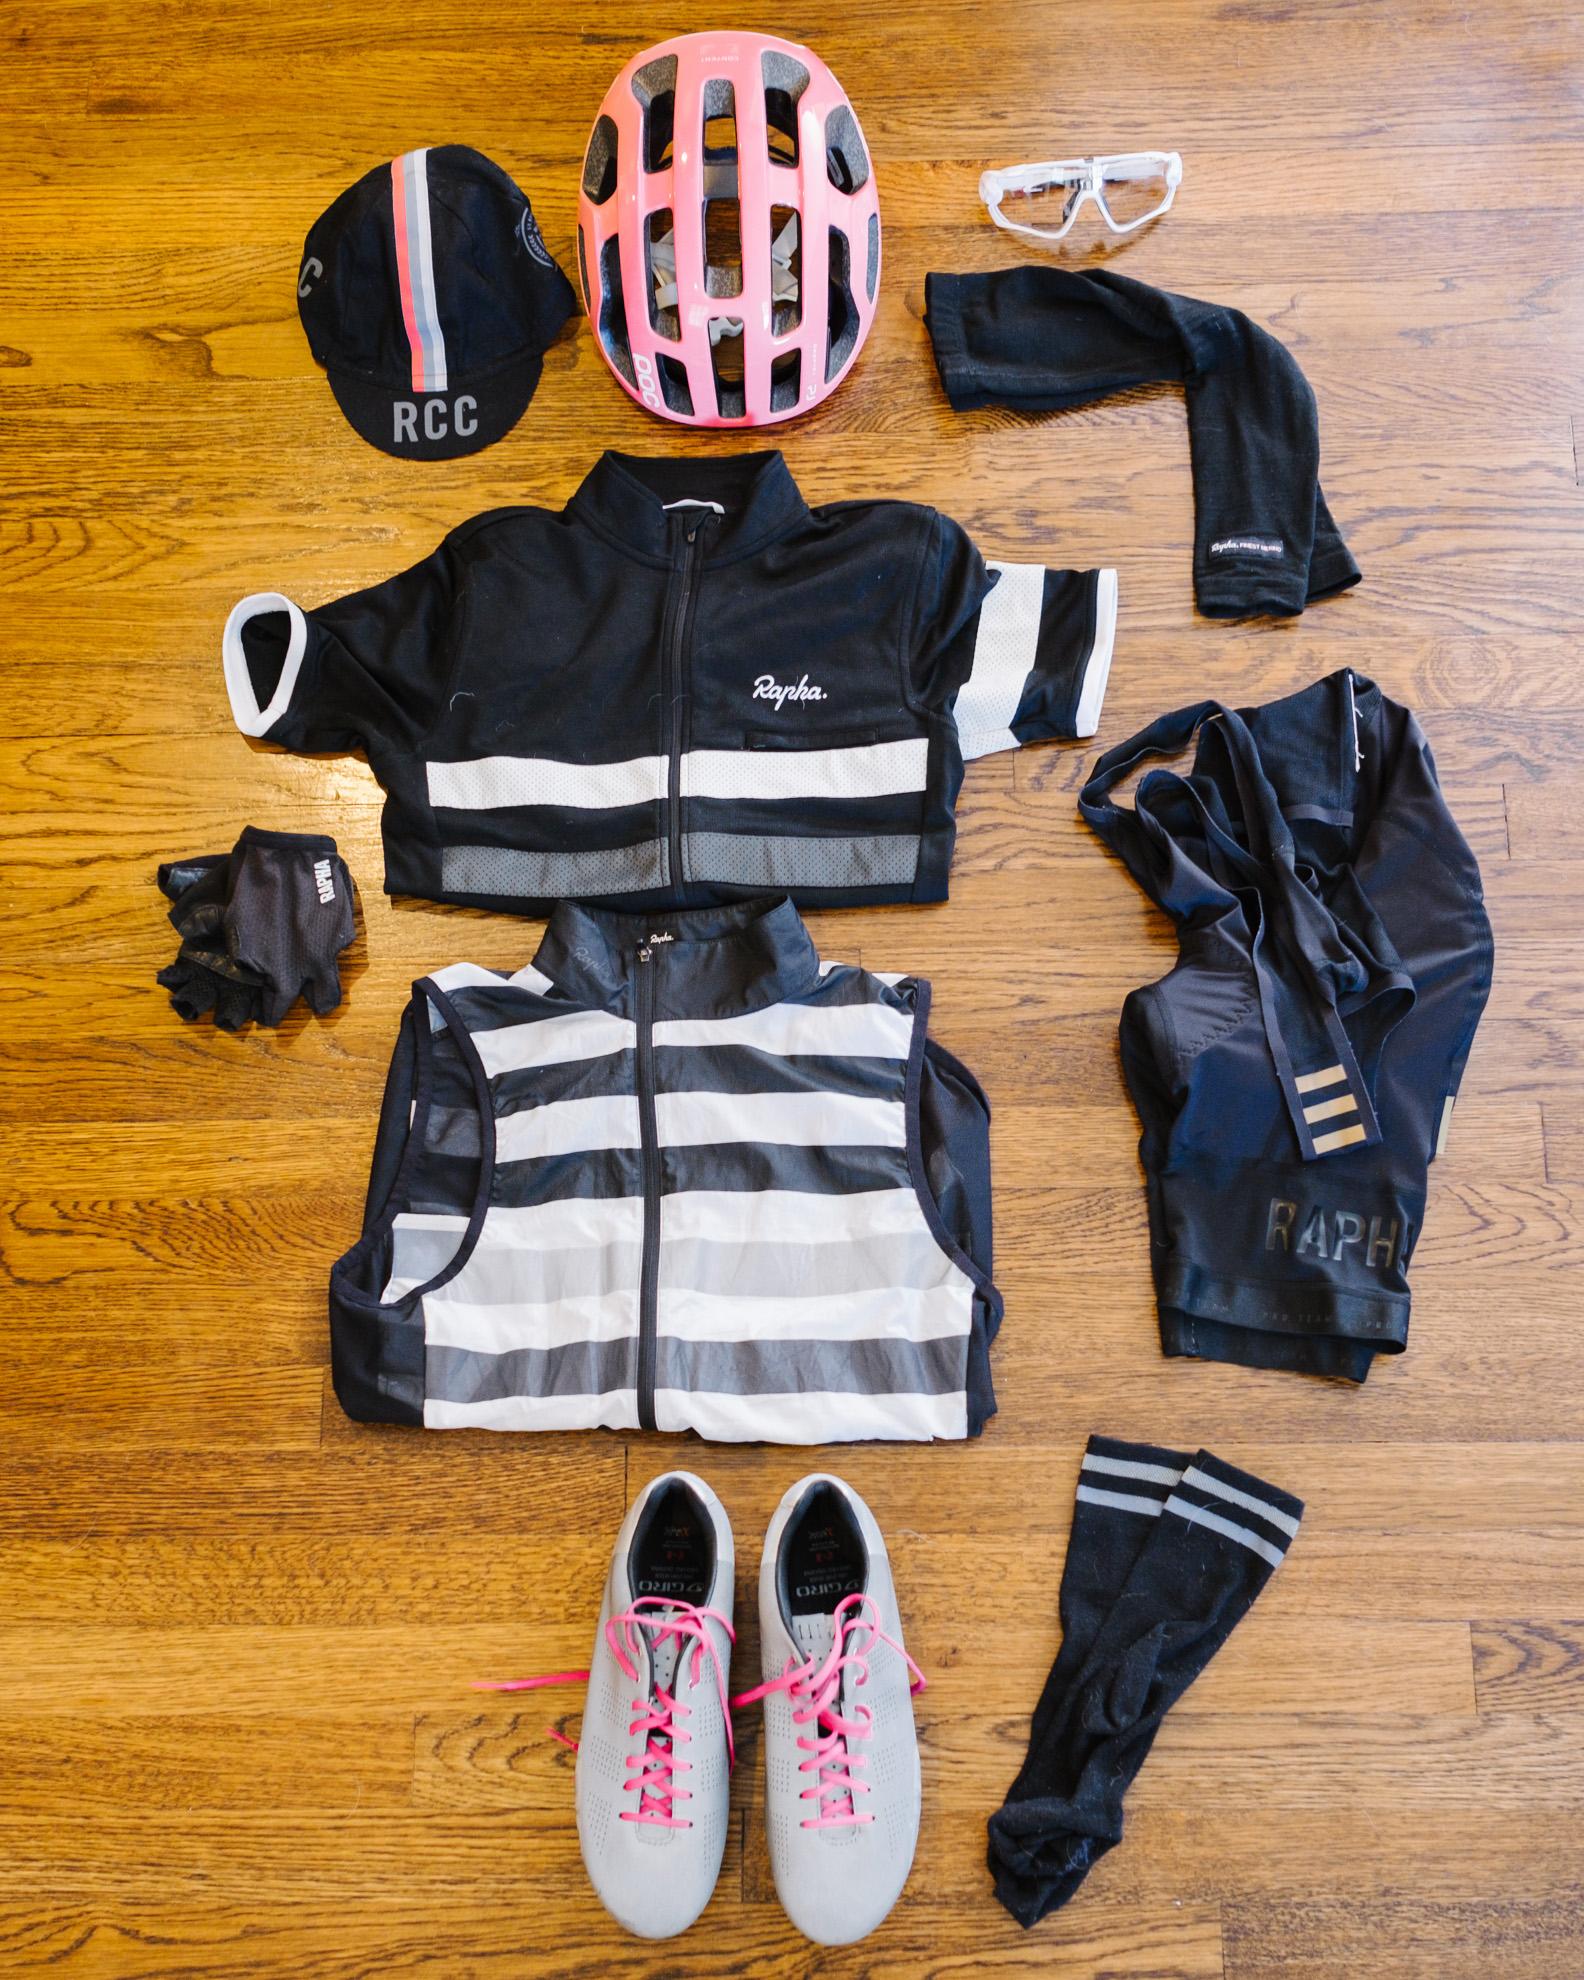 On the bike: apparel